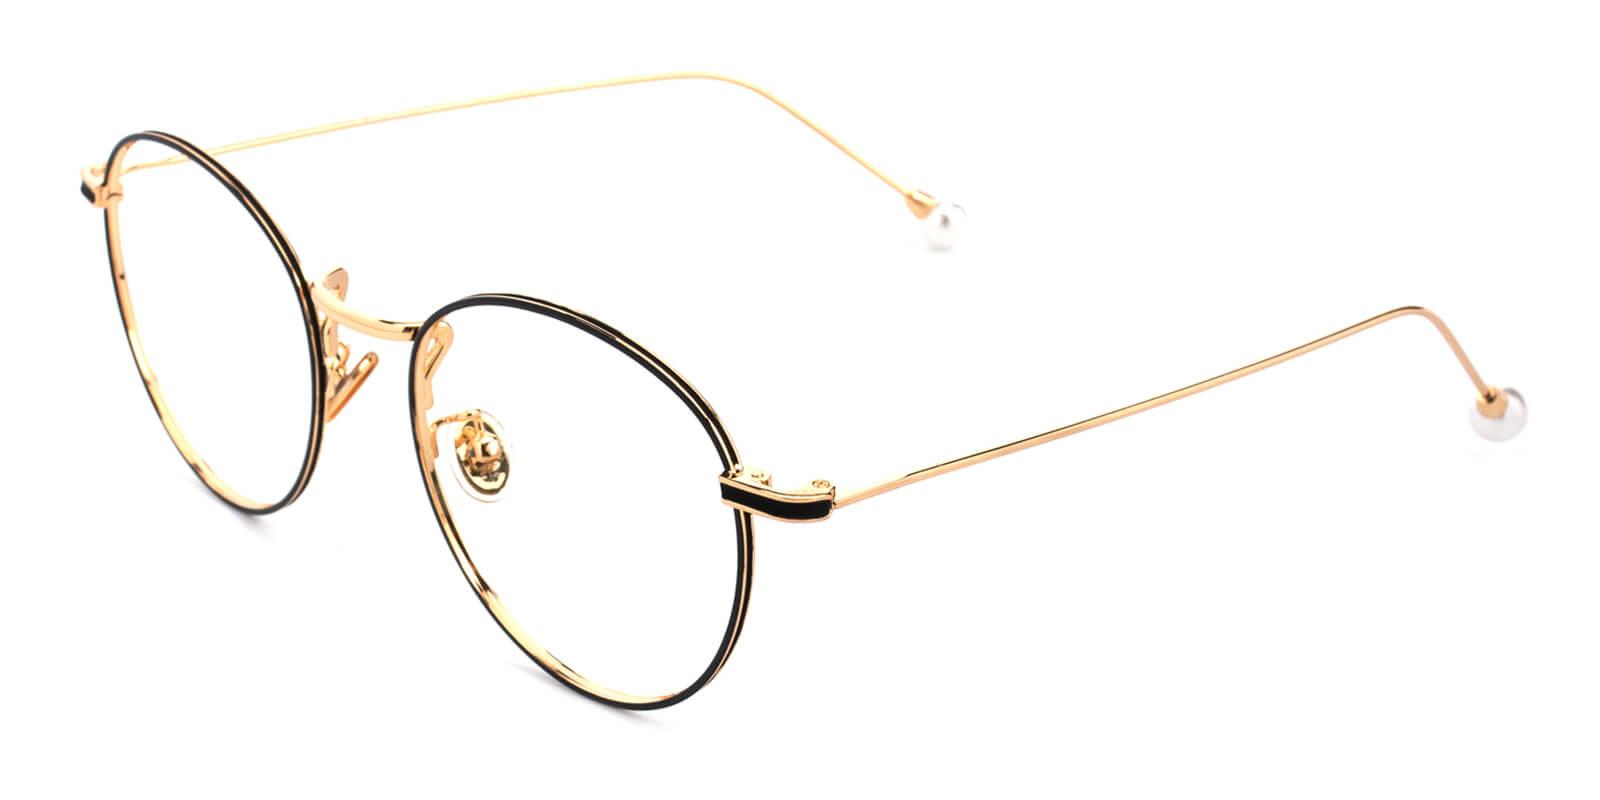 Frail-Pattern-Round-Metal-Eyeglasses-additional1